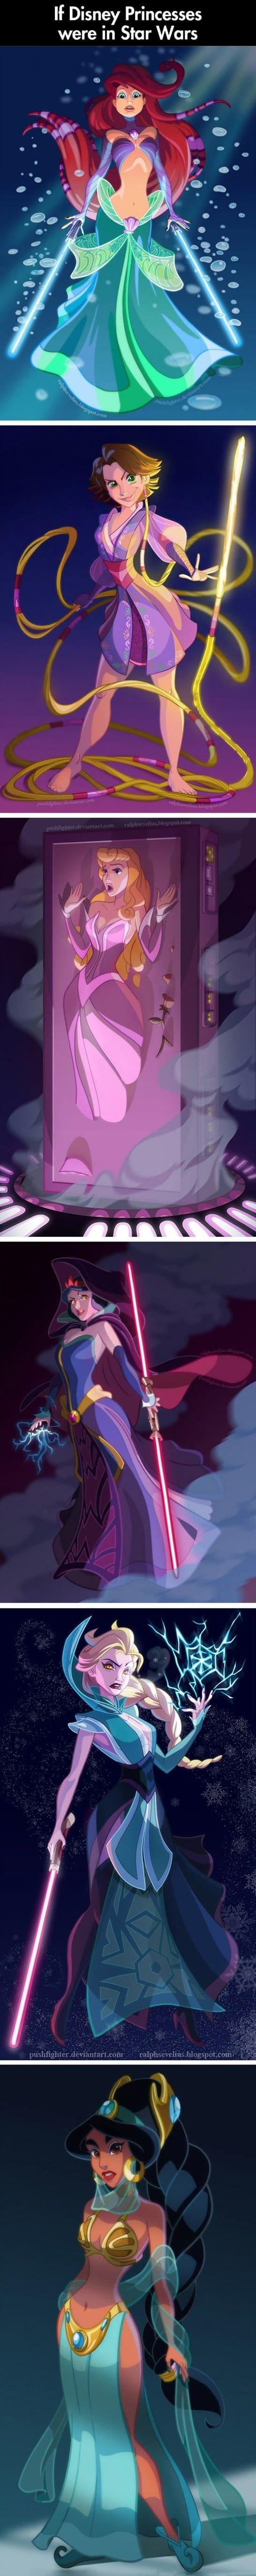 if-disney-princesses-were-in-star-wars